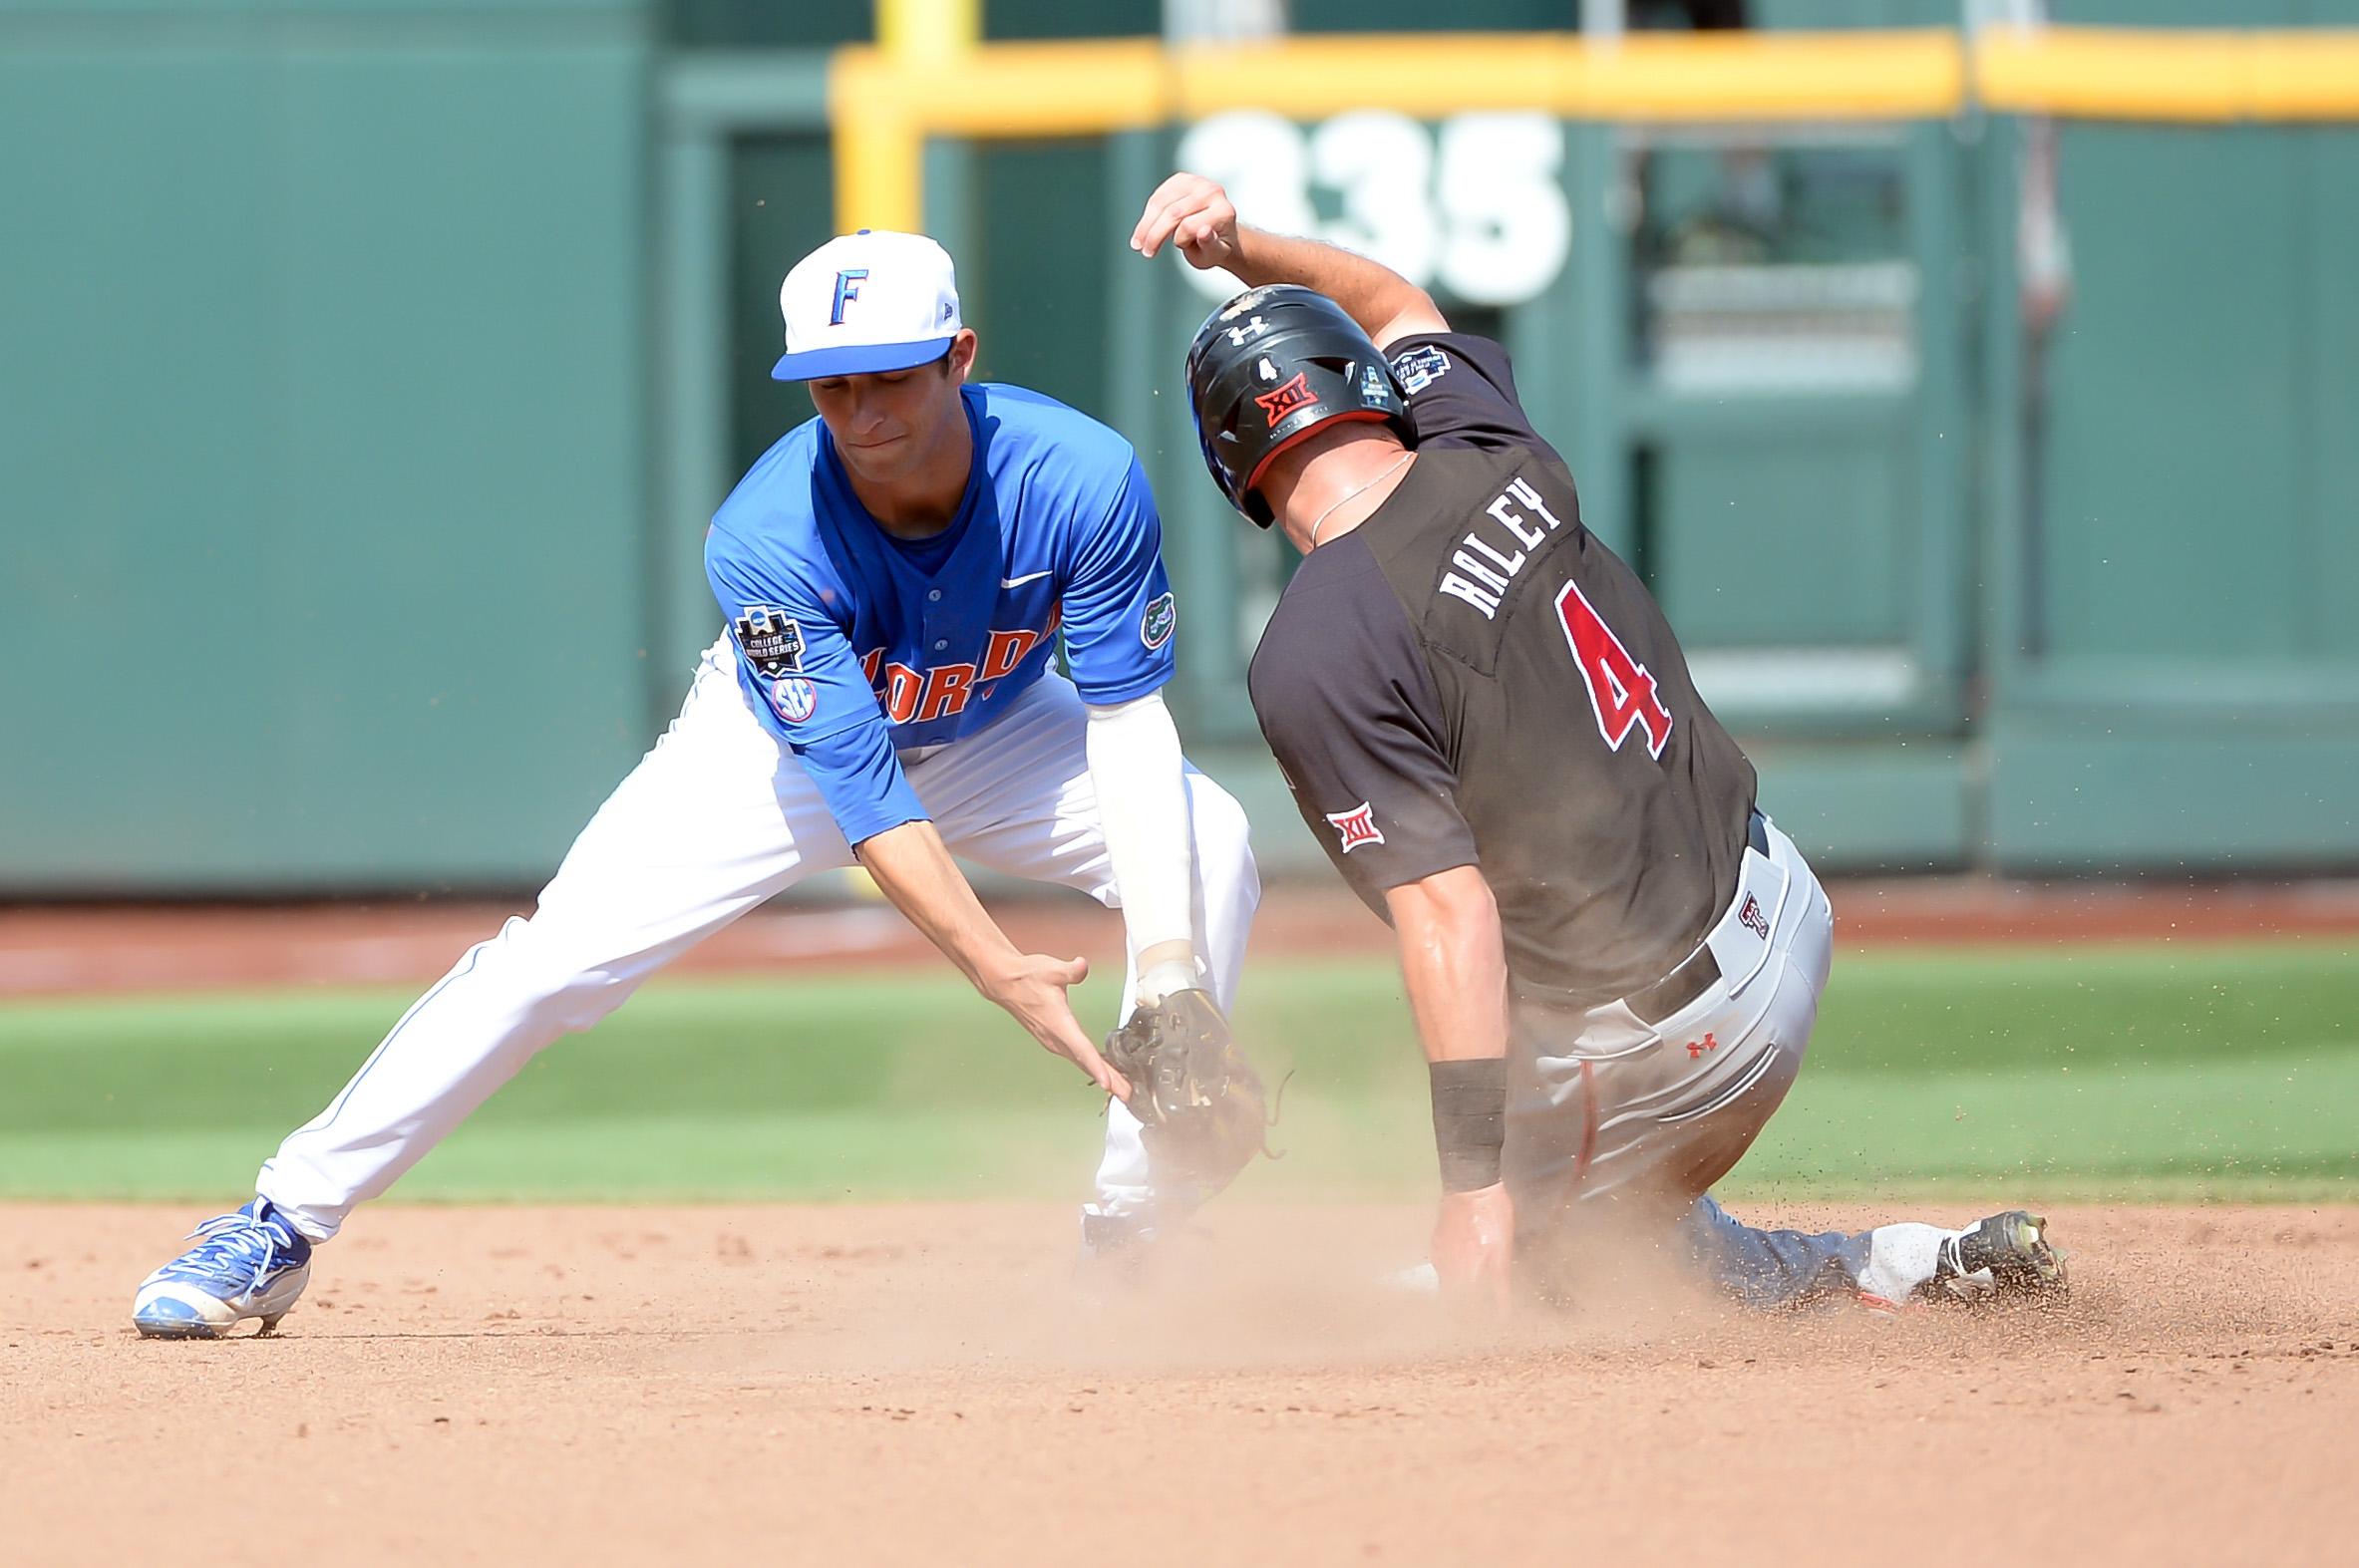 9350497-ncaa-baseball-college-world-series-florida-vs-texas-tech